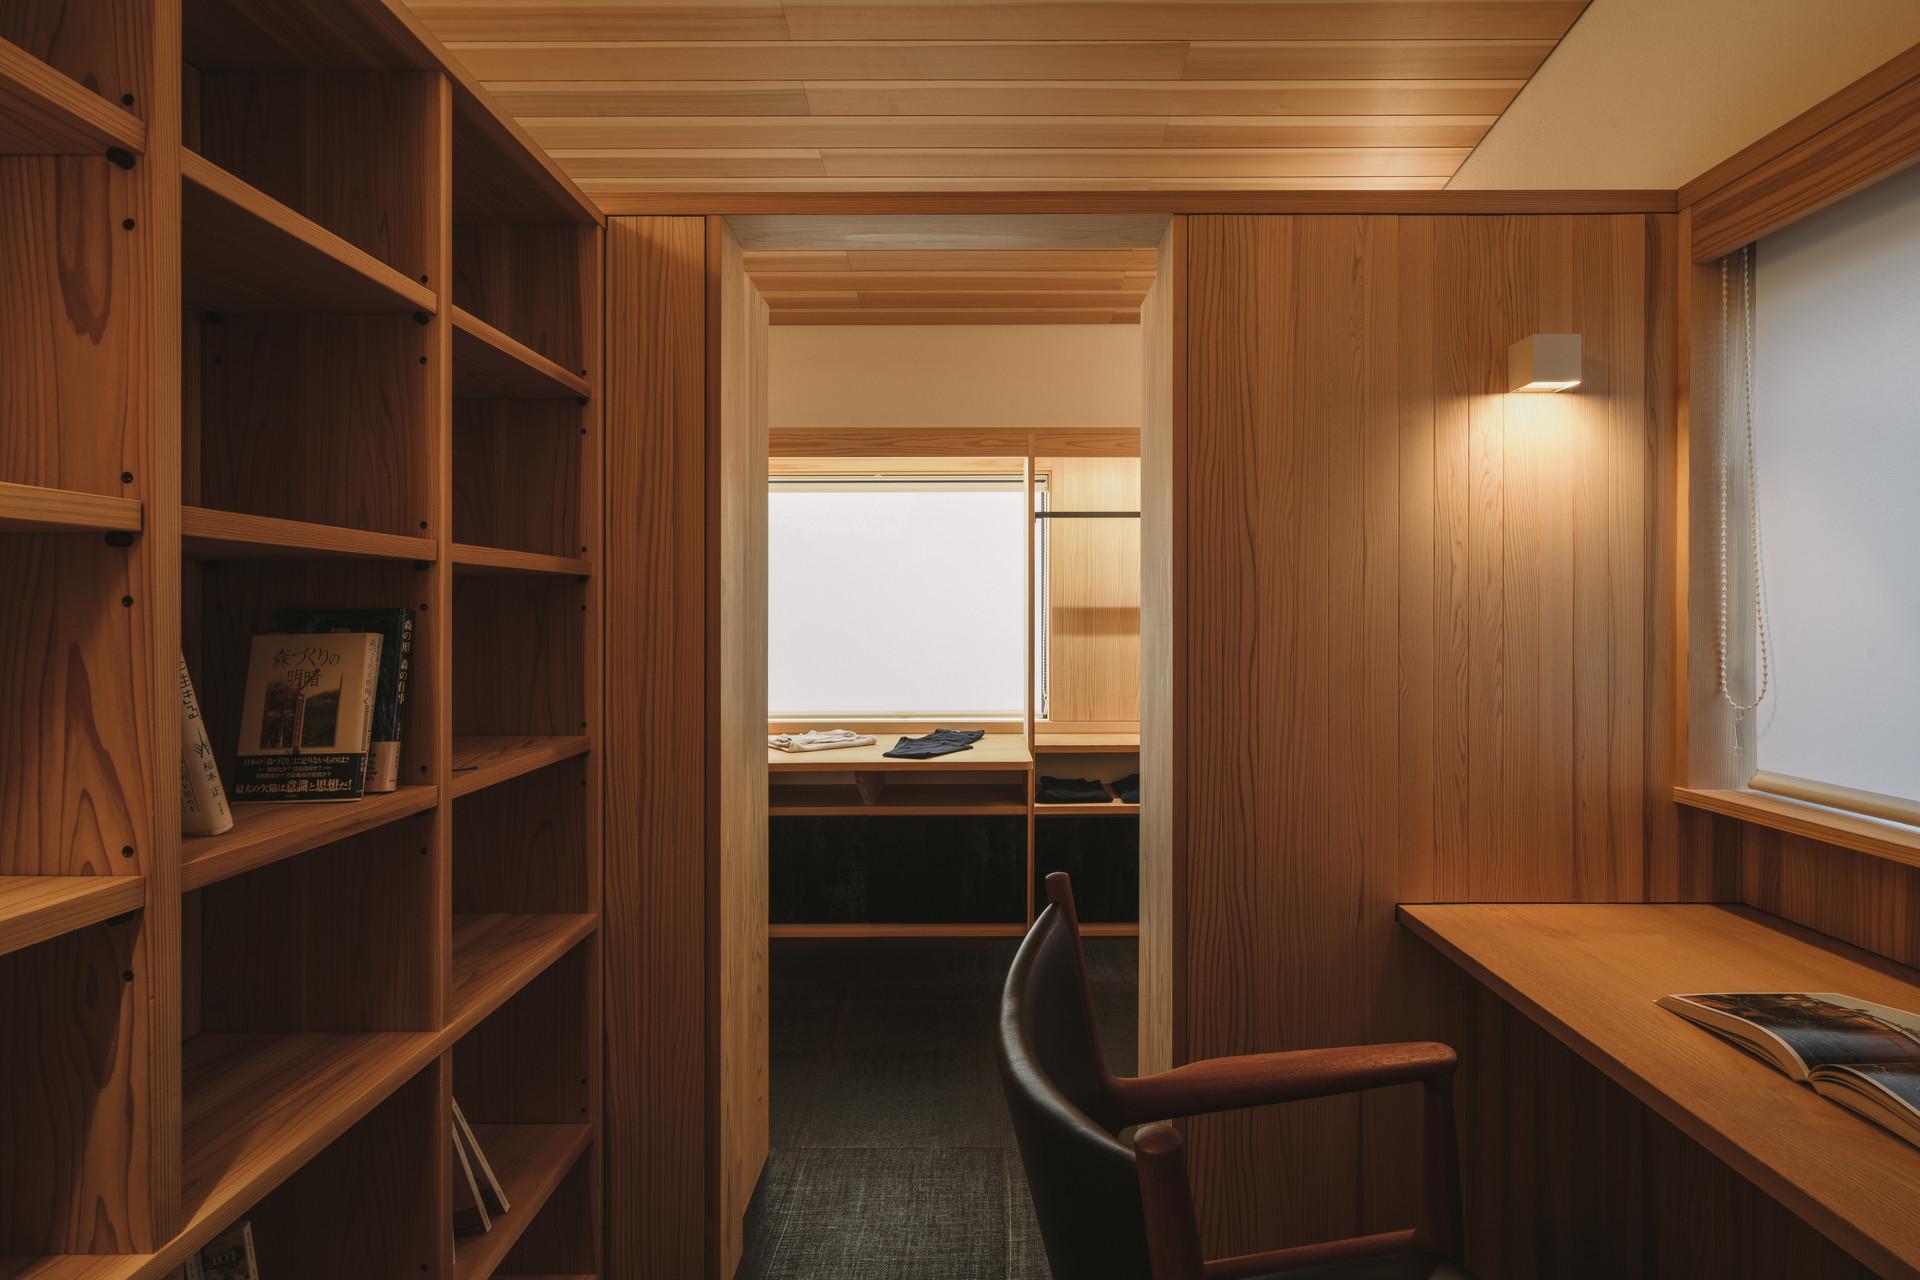 nagano-house_resize-41.jpg